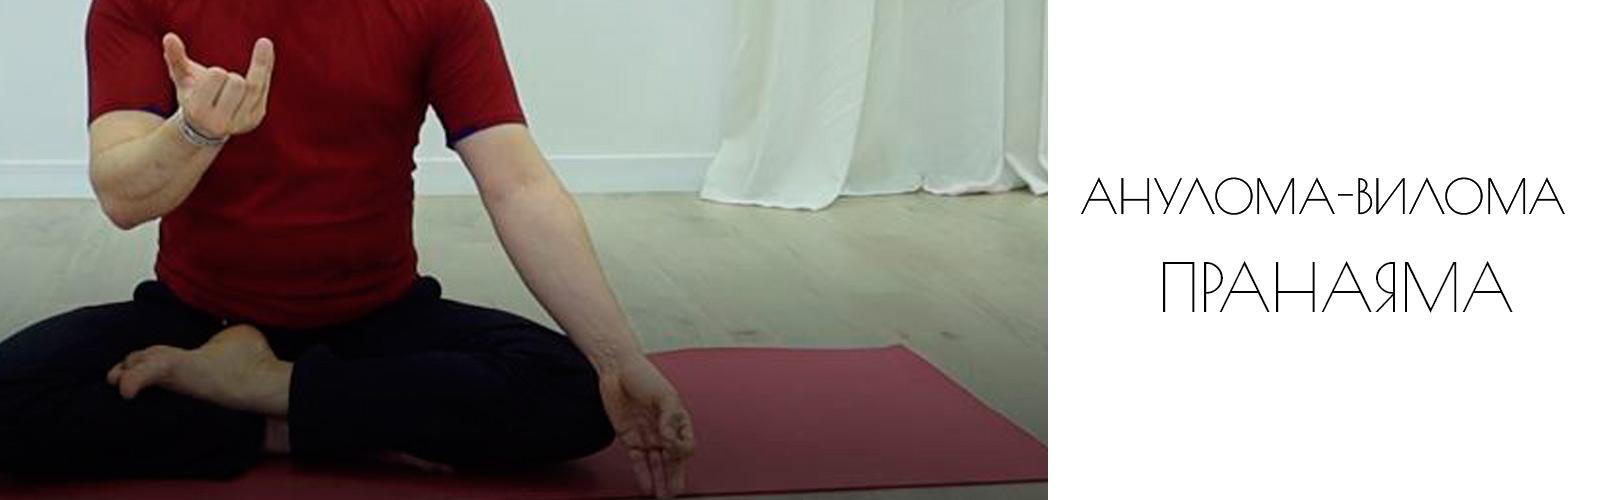 Пранаяма для начинающих упражнения анулома-вилома